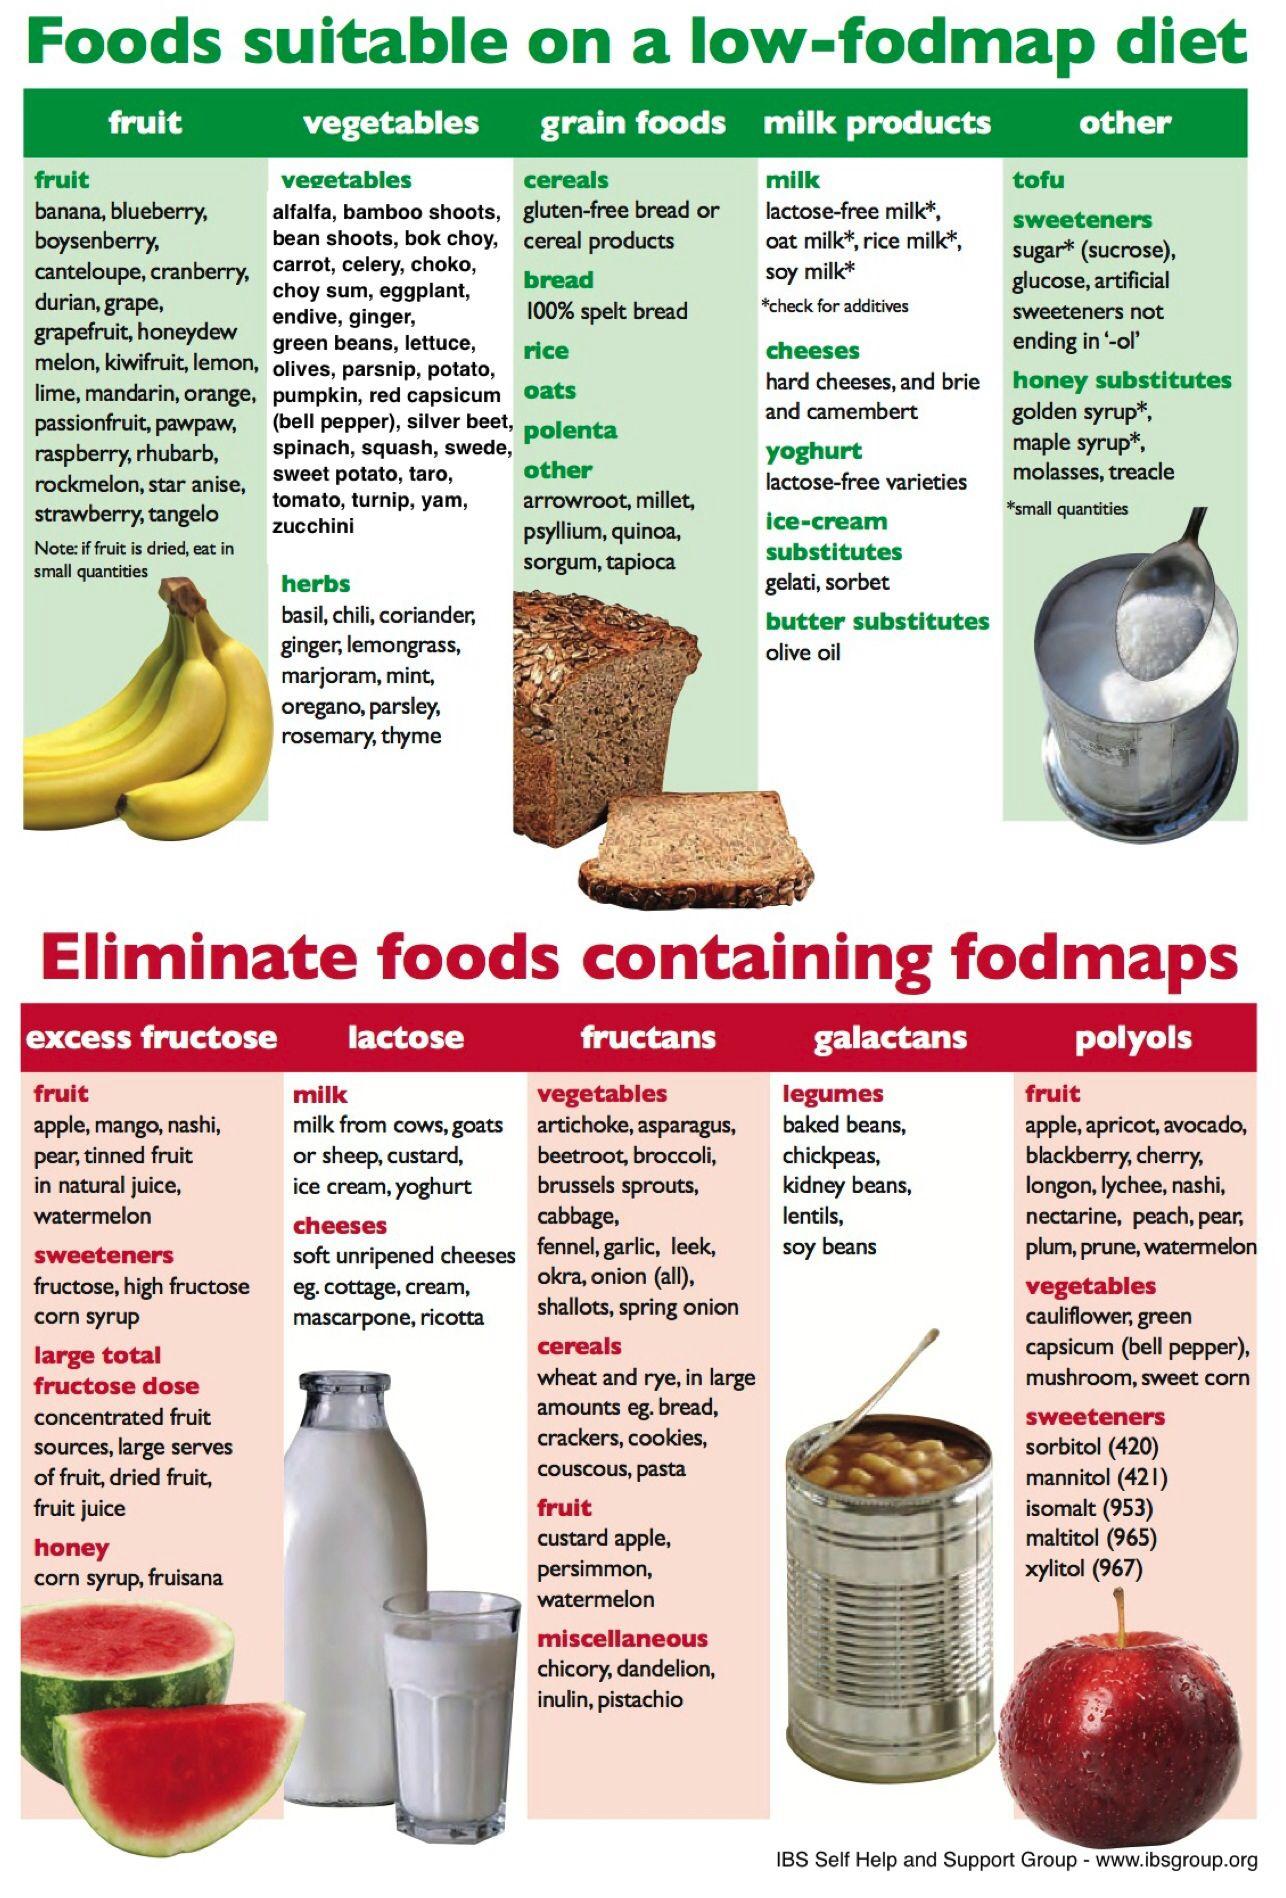 fodmap diet plan for ulcerative colitis